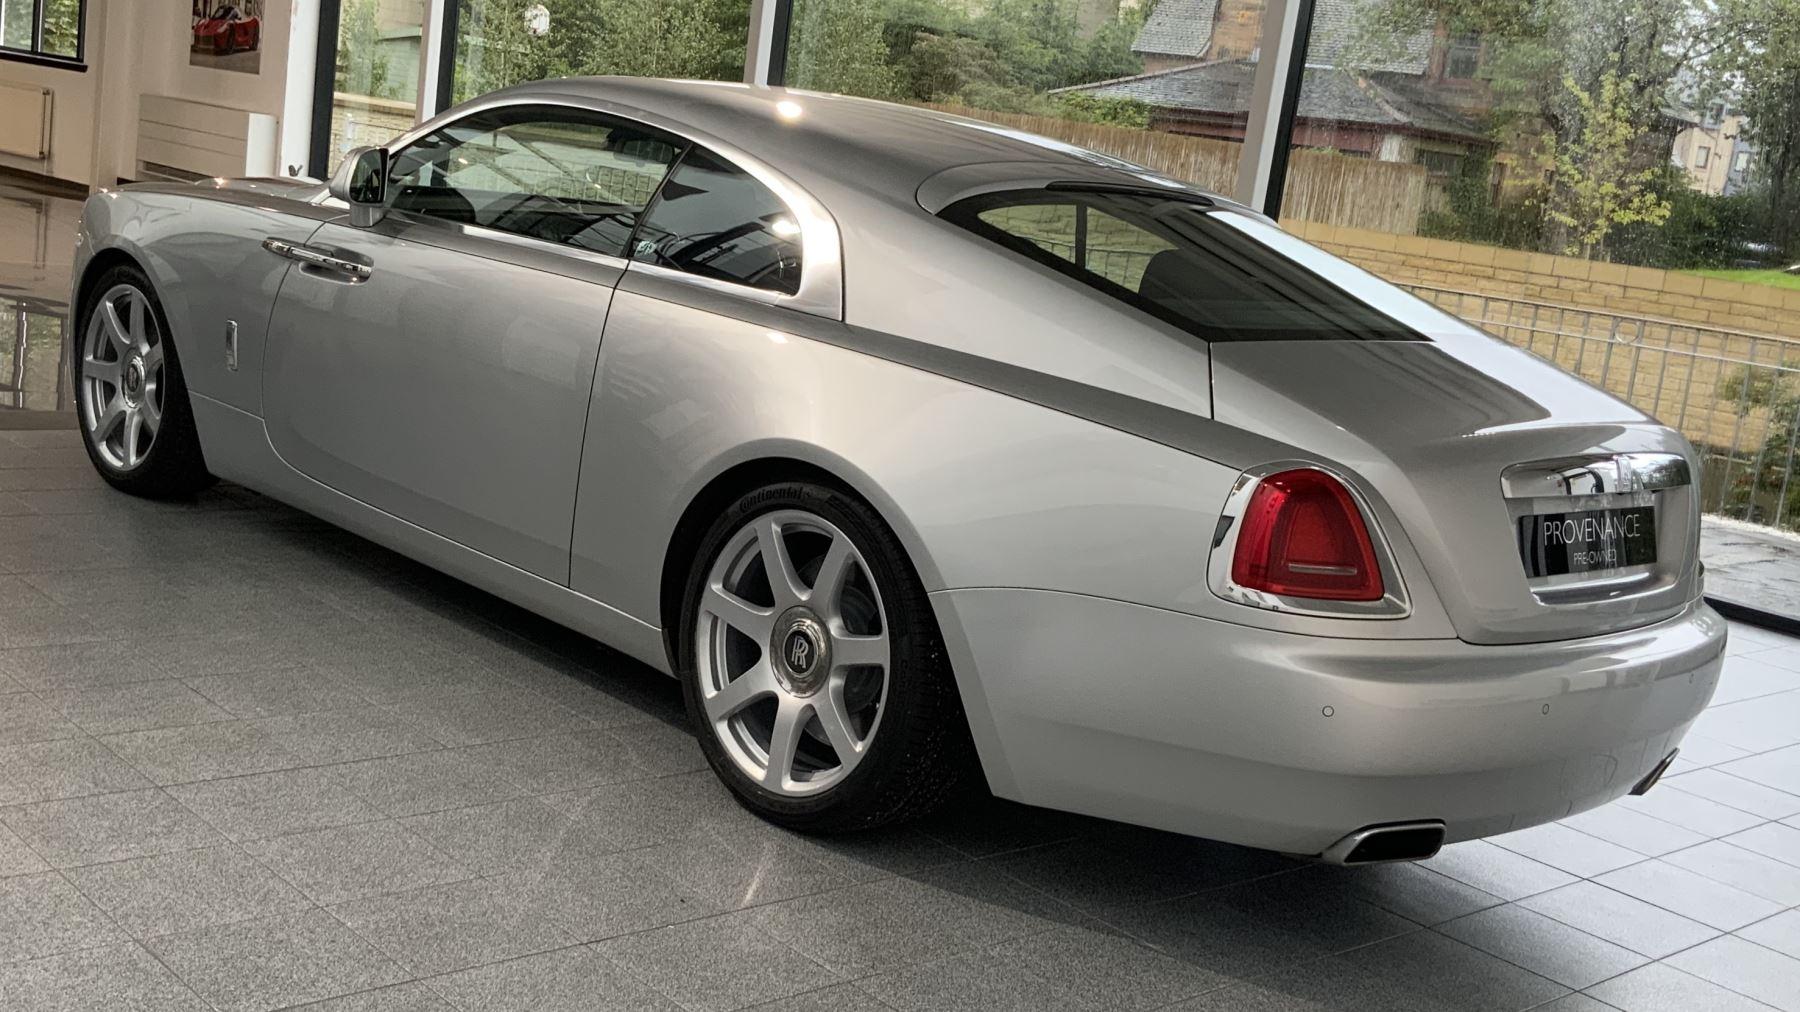 Rolls-Royce Wraith V12 image 5